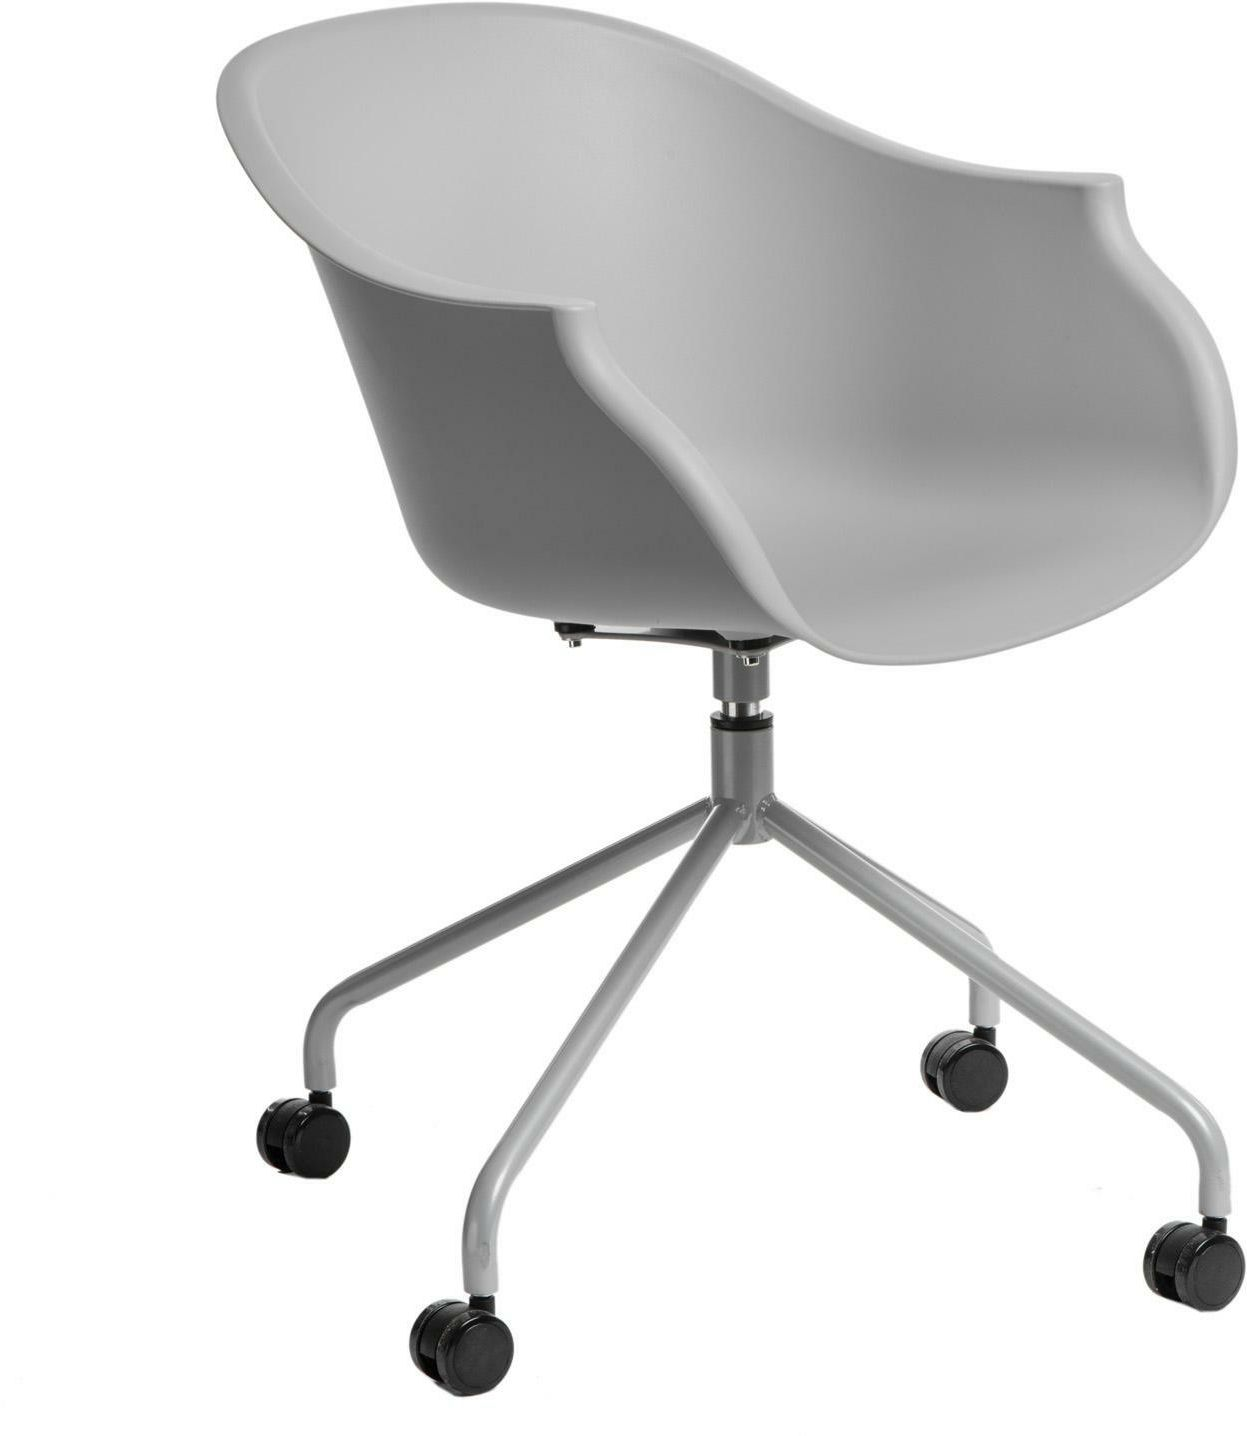 Krzesło na kółkach ROUNDY szare